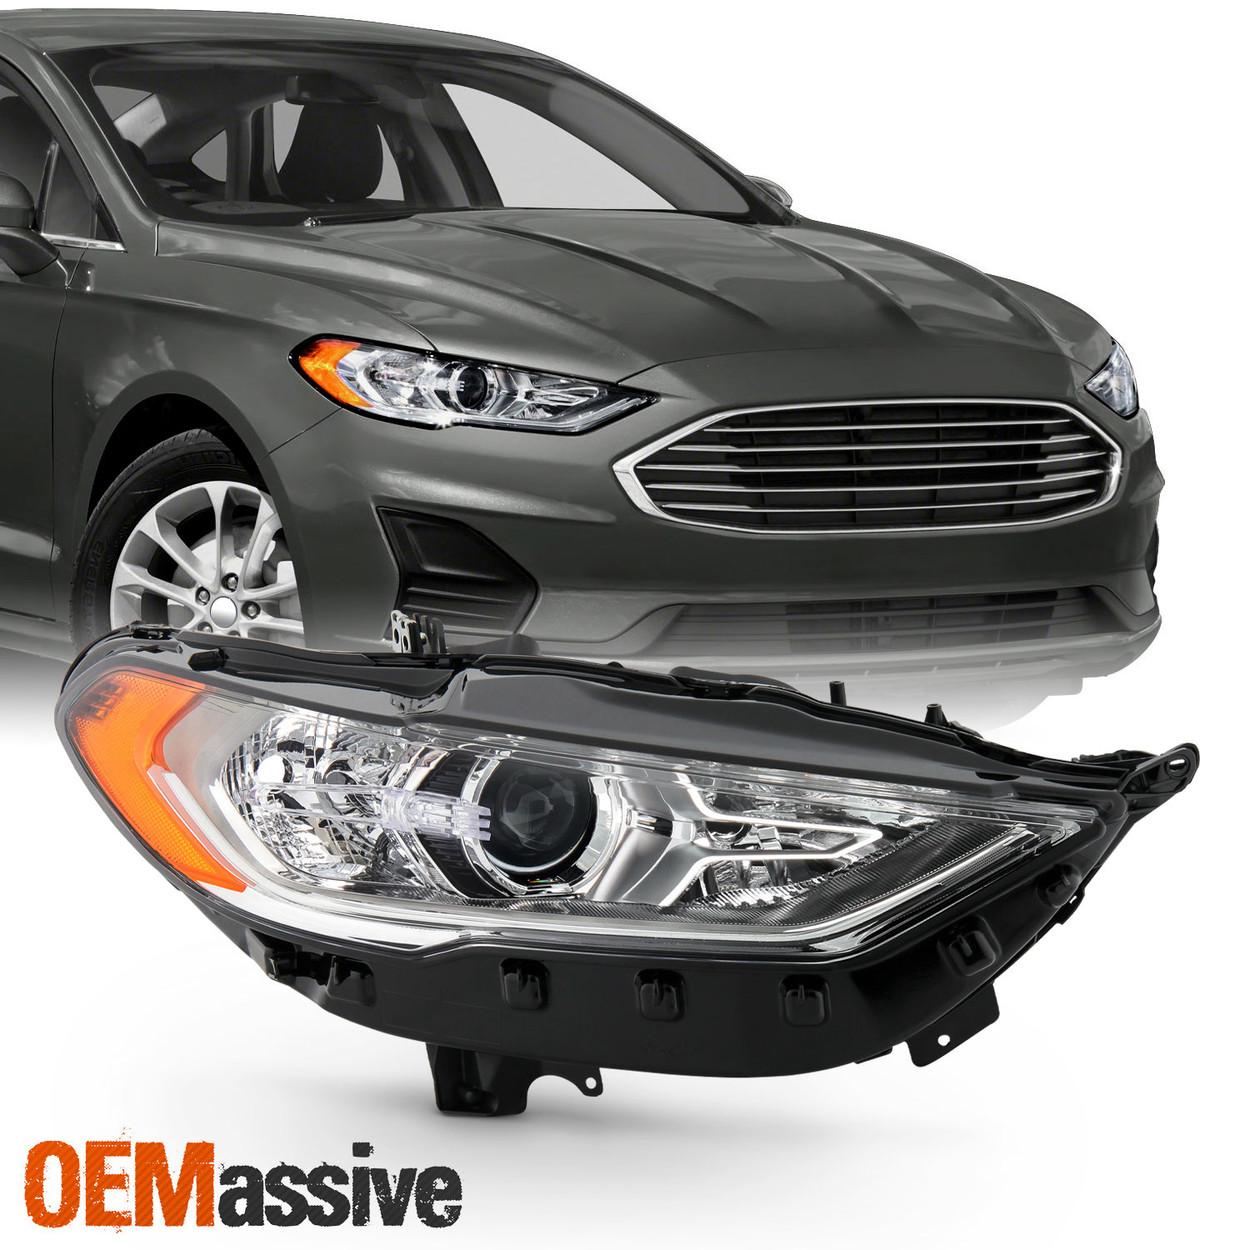 NEW OEM 2017-2020 Ford Super Duty Rear Suspension Brackets RH Passenger 2 EACH